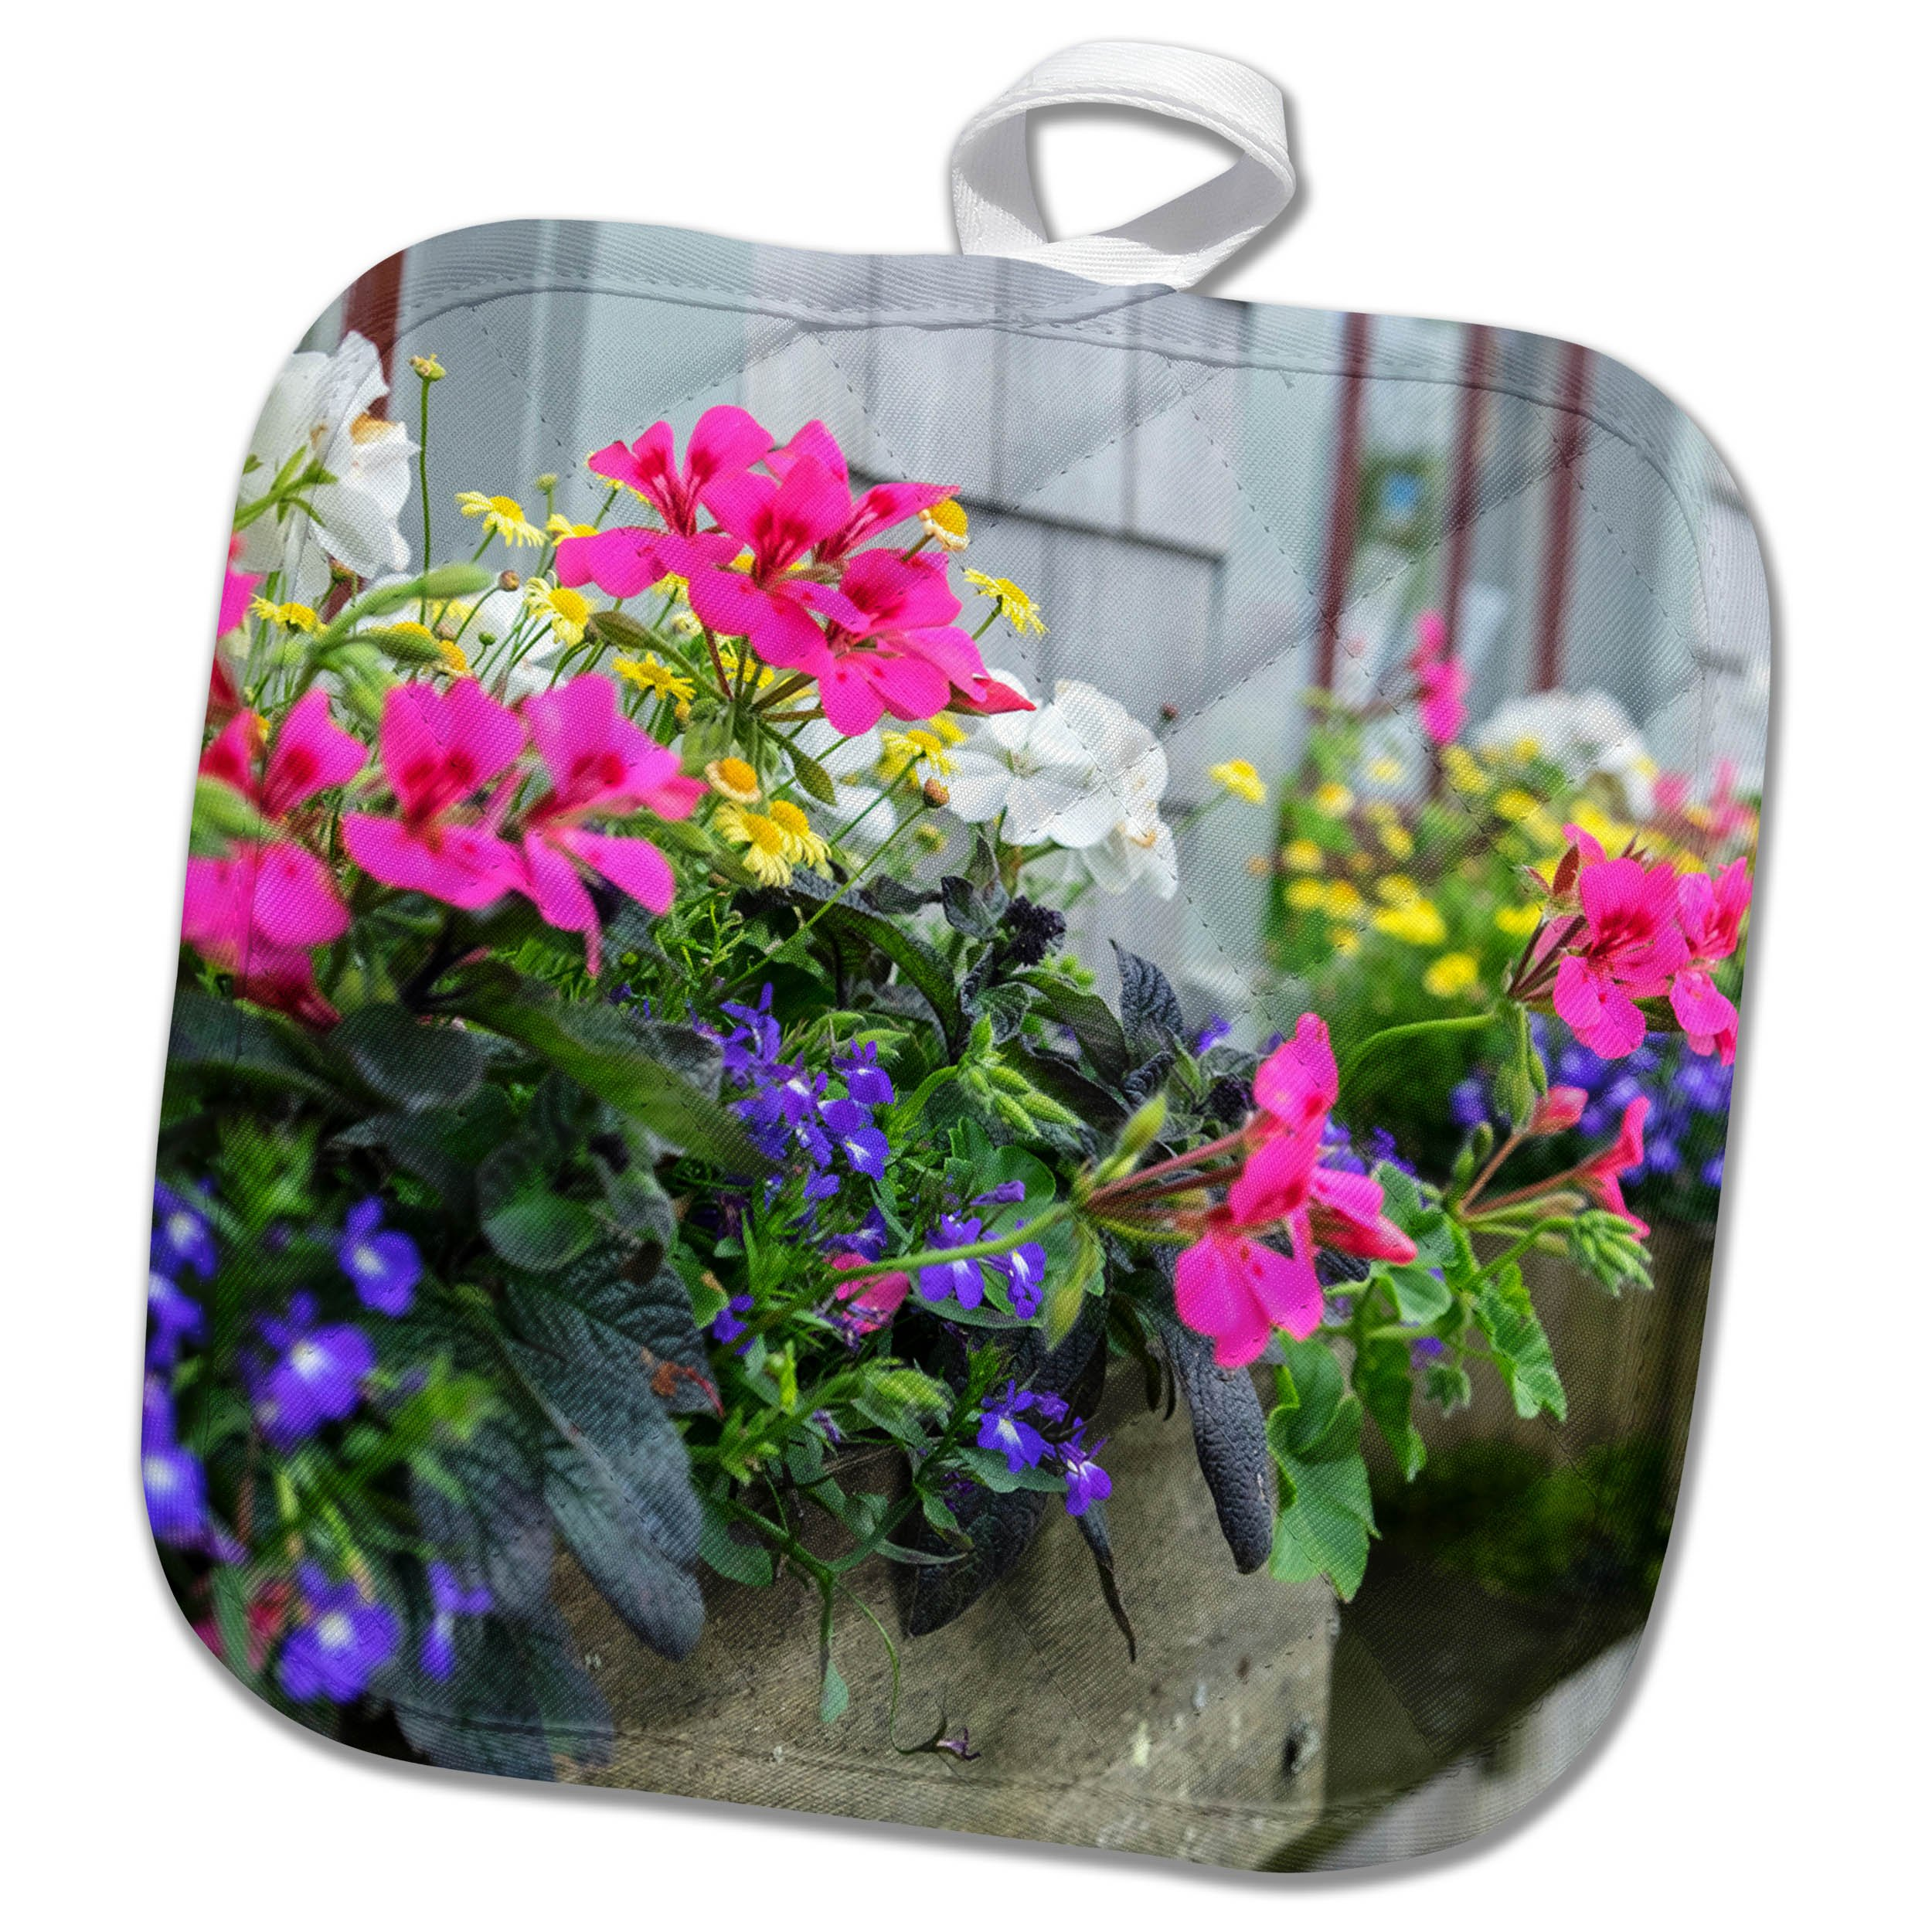 3dRose Danita Delimont - Flowers - Flowers in window boxes, Nantucket, Massachusetts, USA - 8x8 Potholder (phl_279042_1)